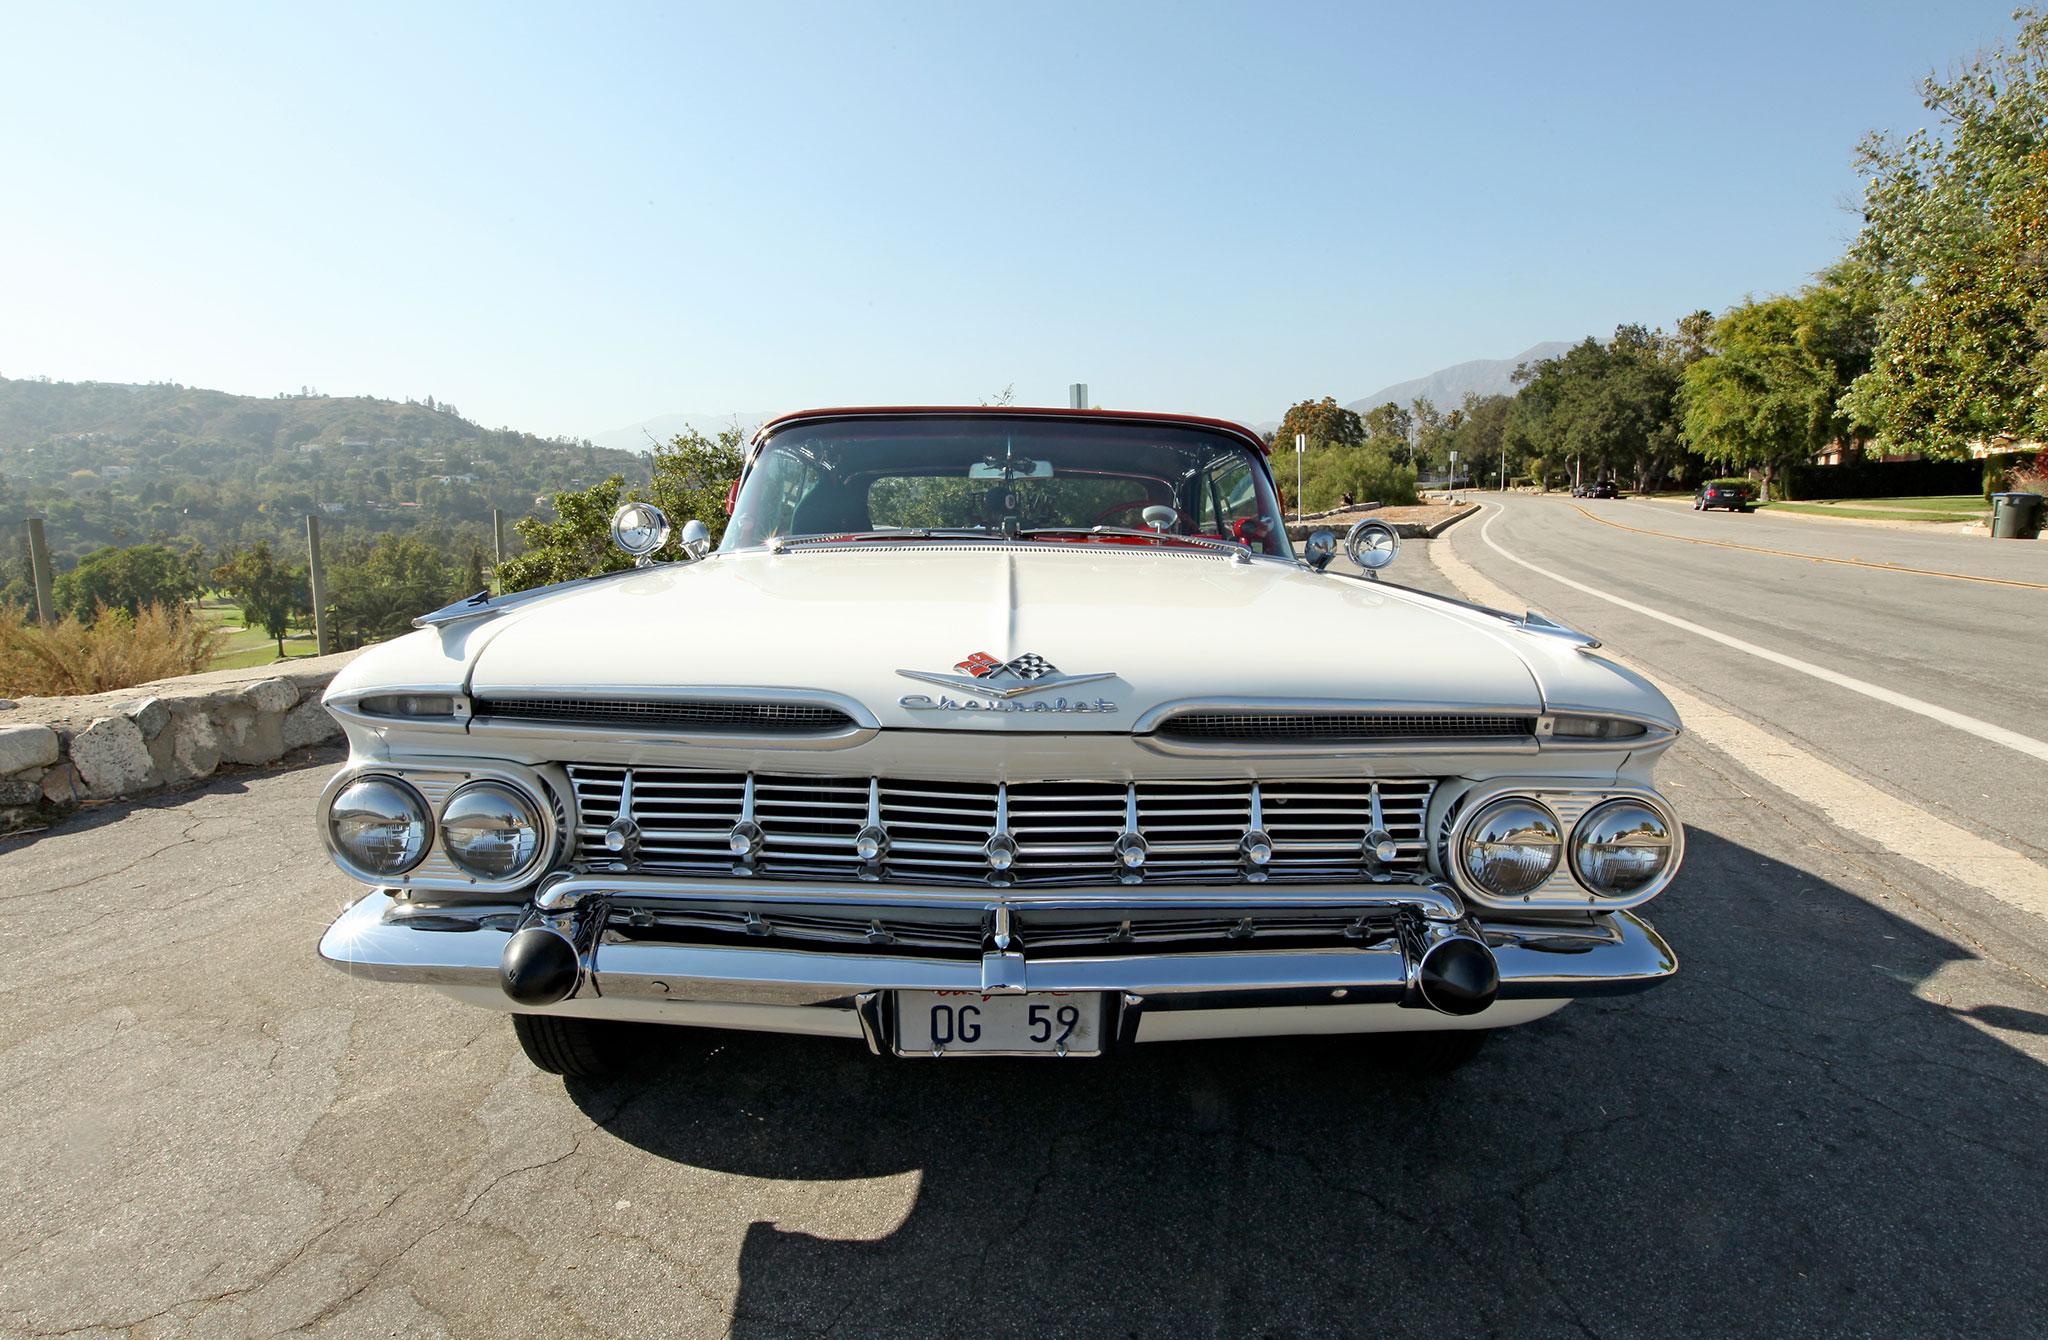 1959 Chevrolet Impala Convertible - Semi Retired